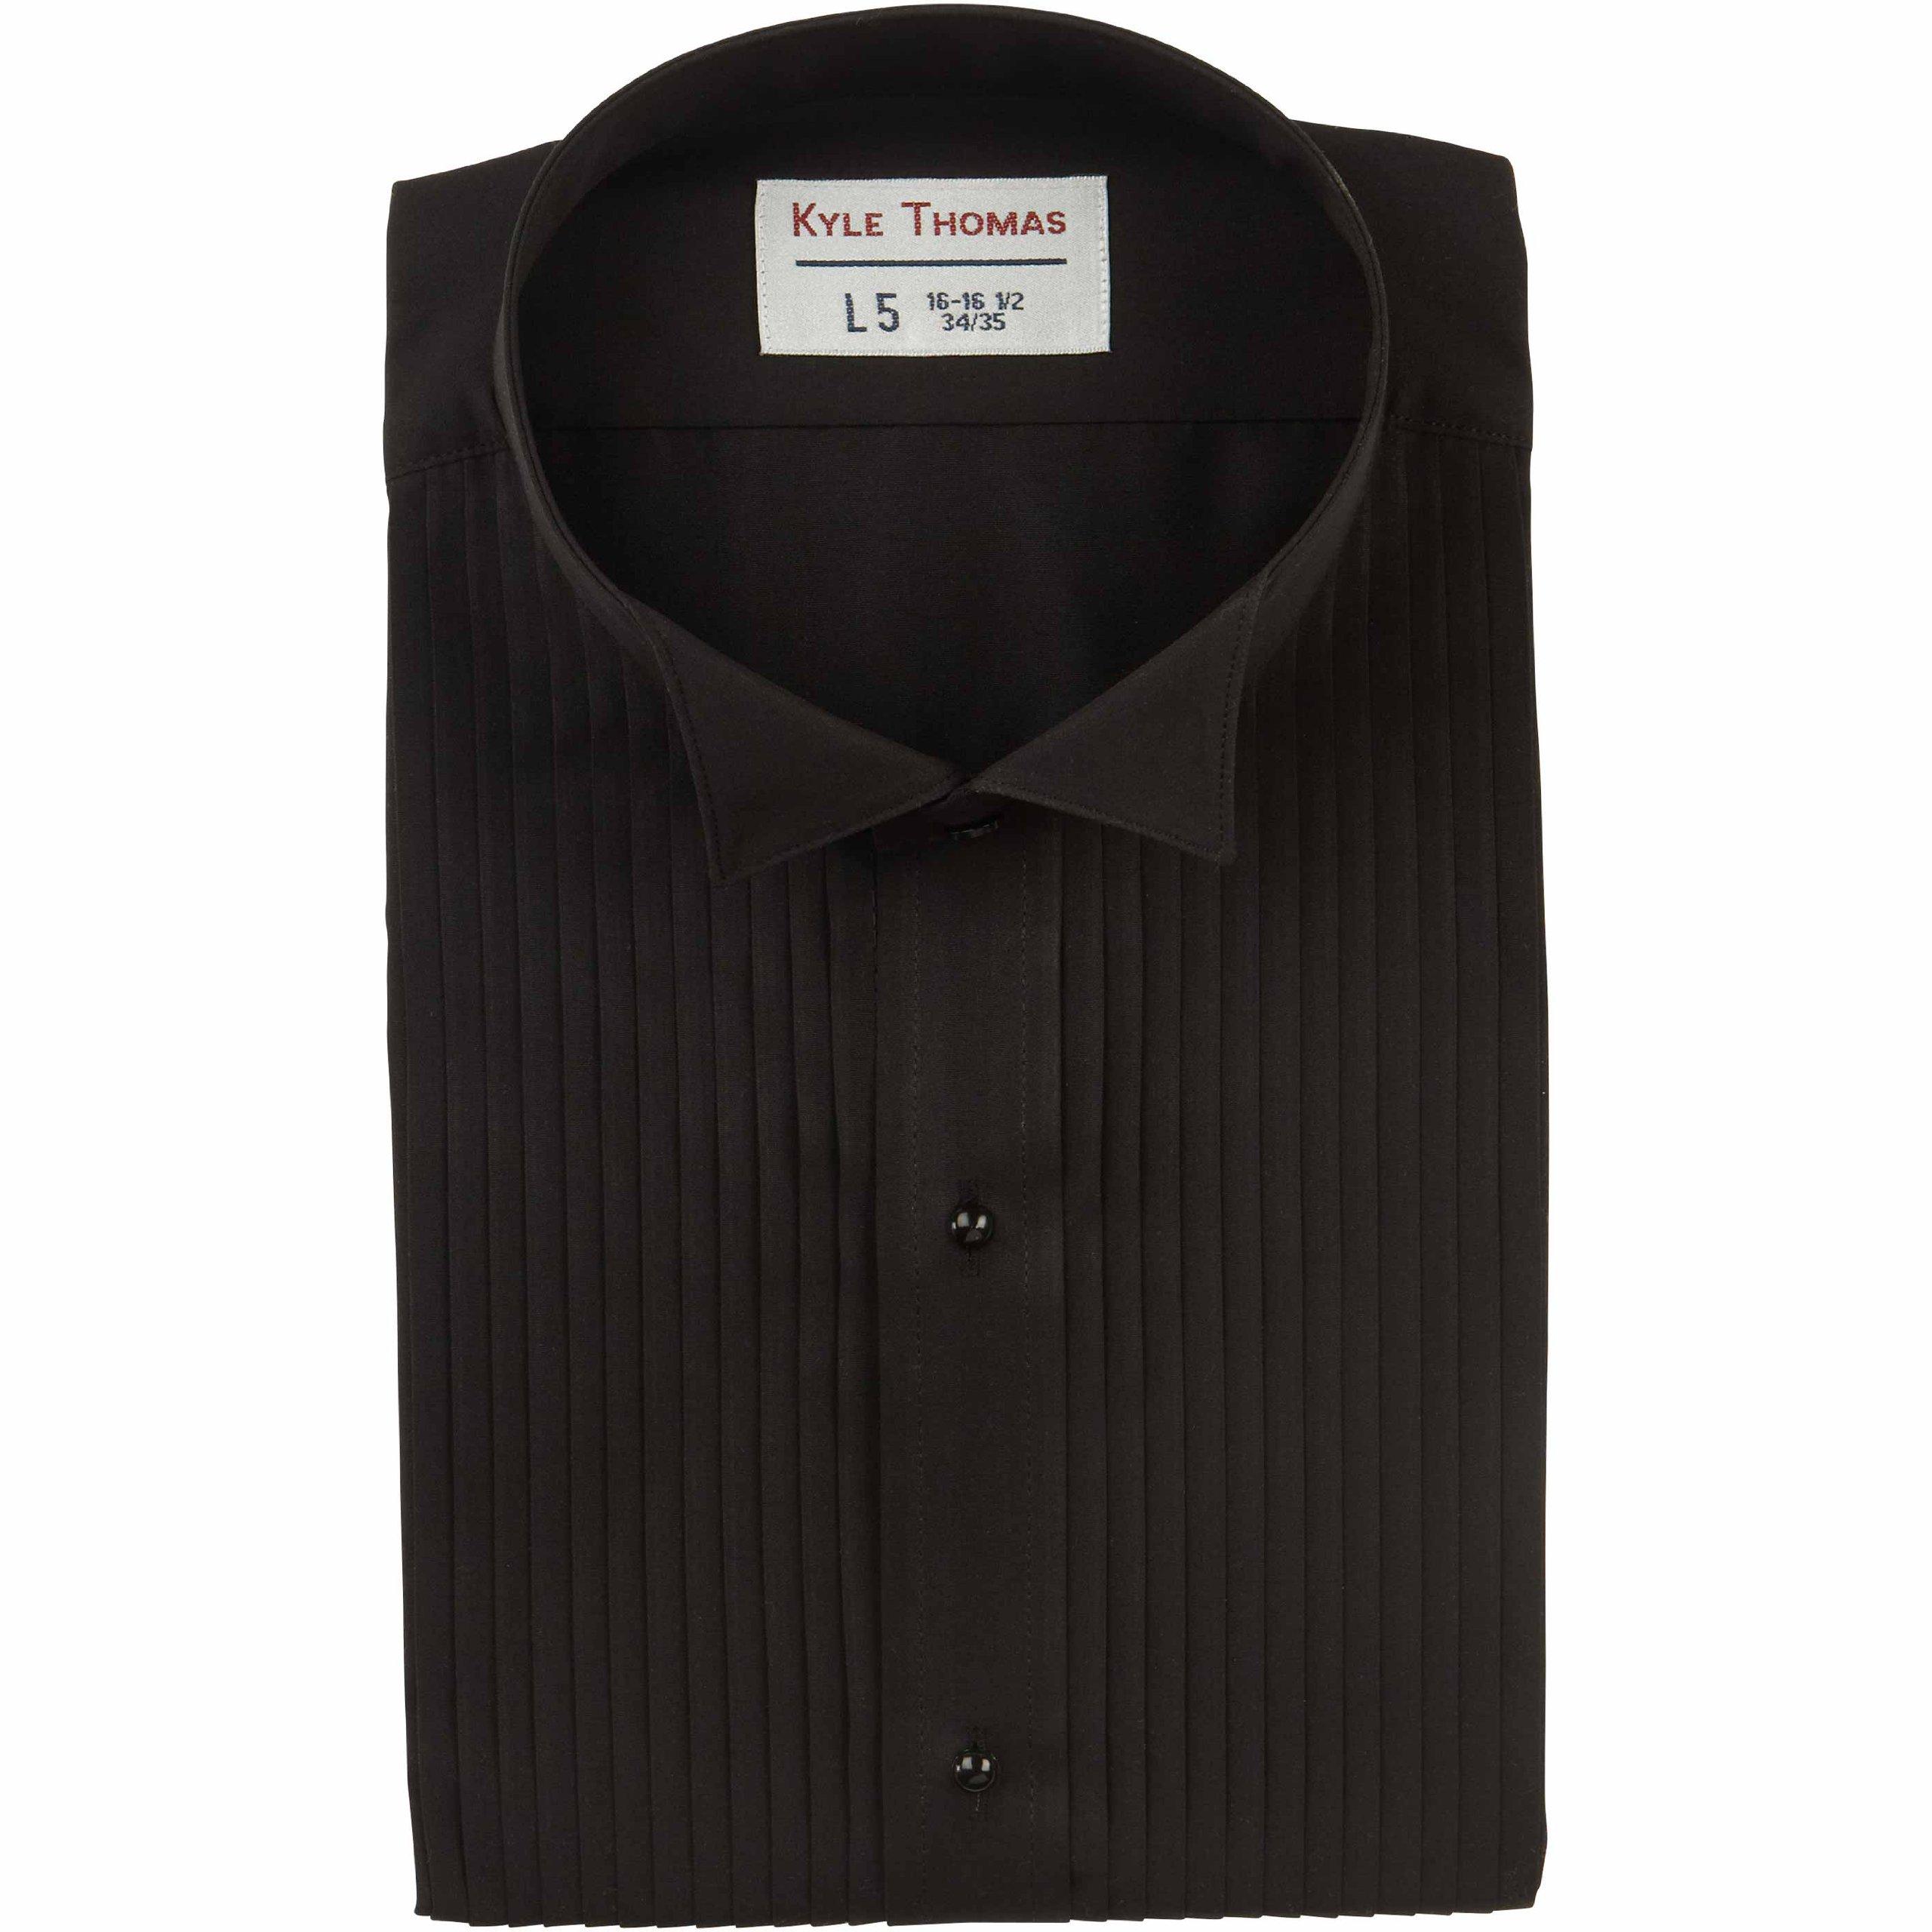 Kyle Thomas Men's 1/4'' Pleat Wing Collar Tuxedo Shirt , Black, L (16.5'' Neck)/ 35'' Sleeve